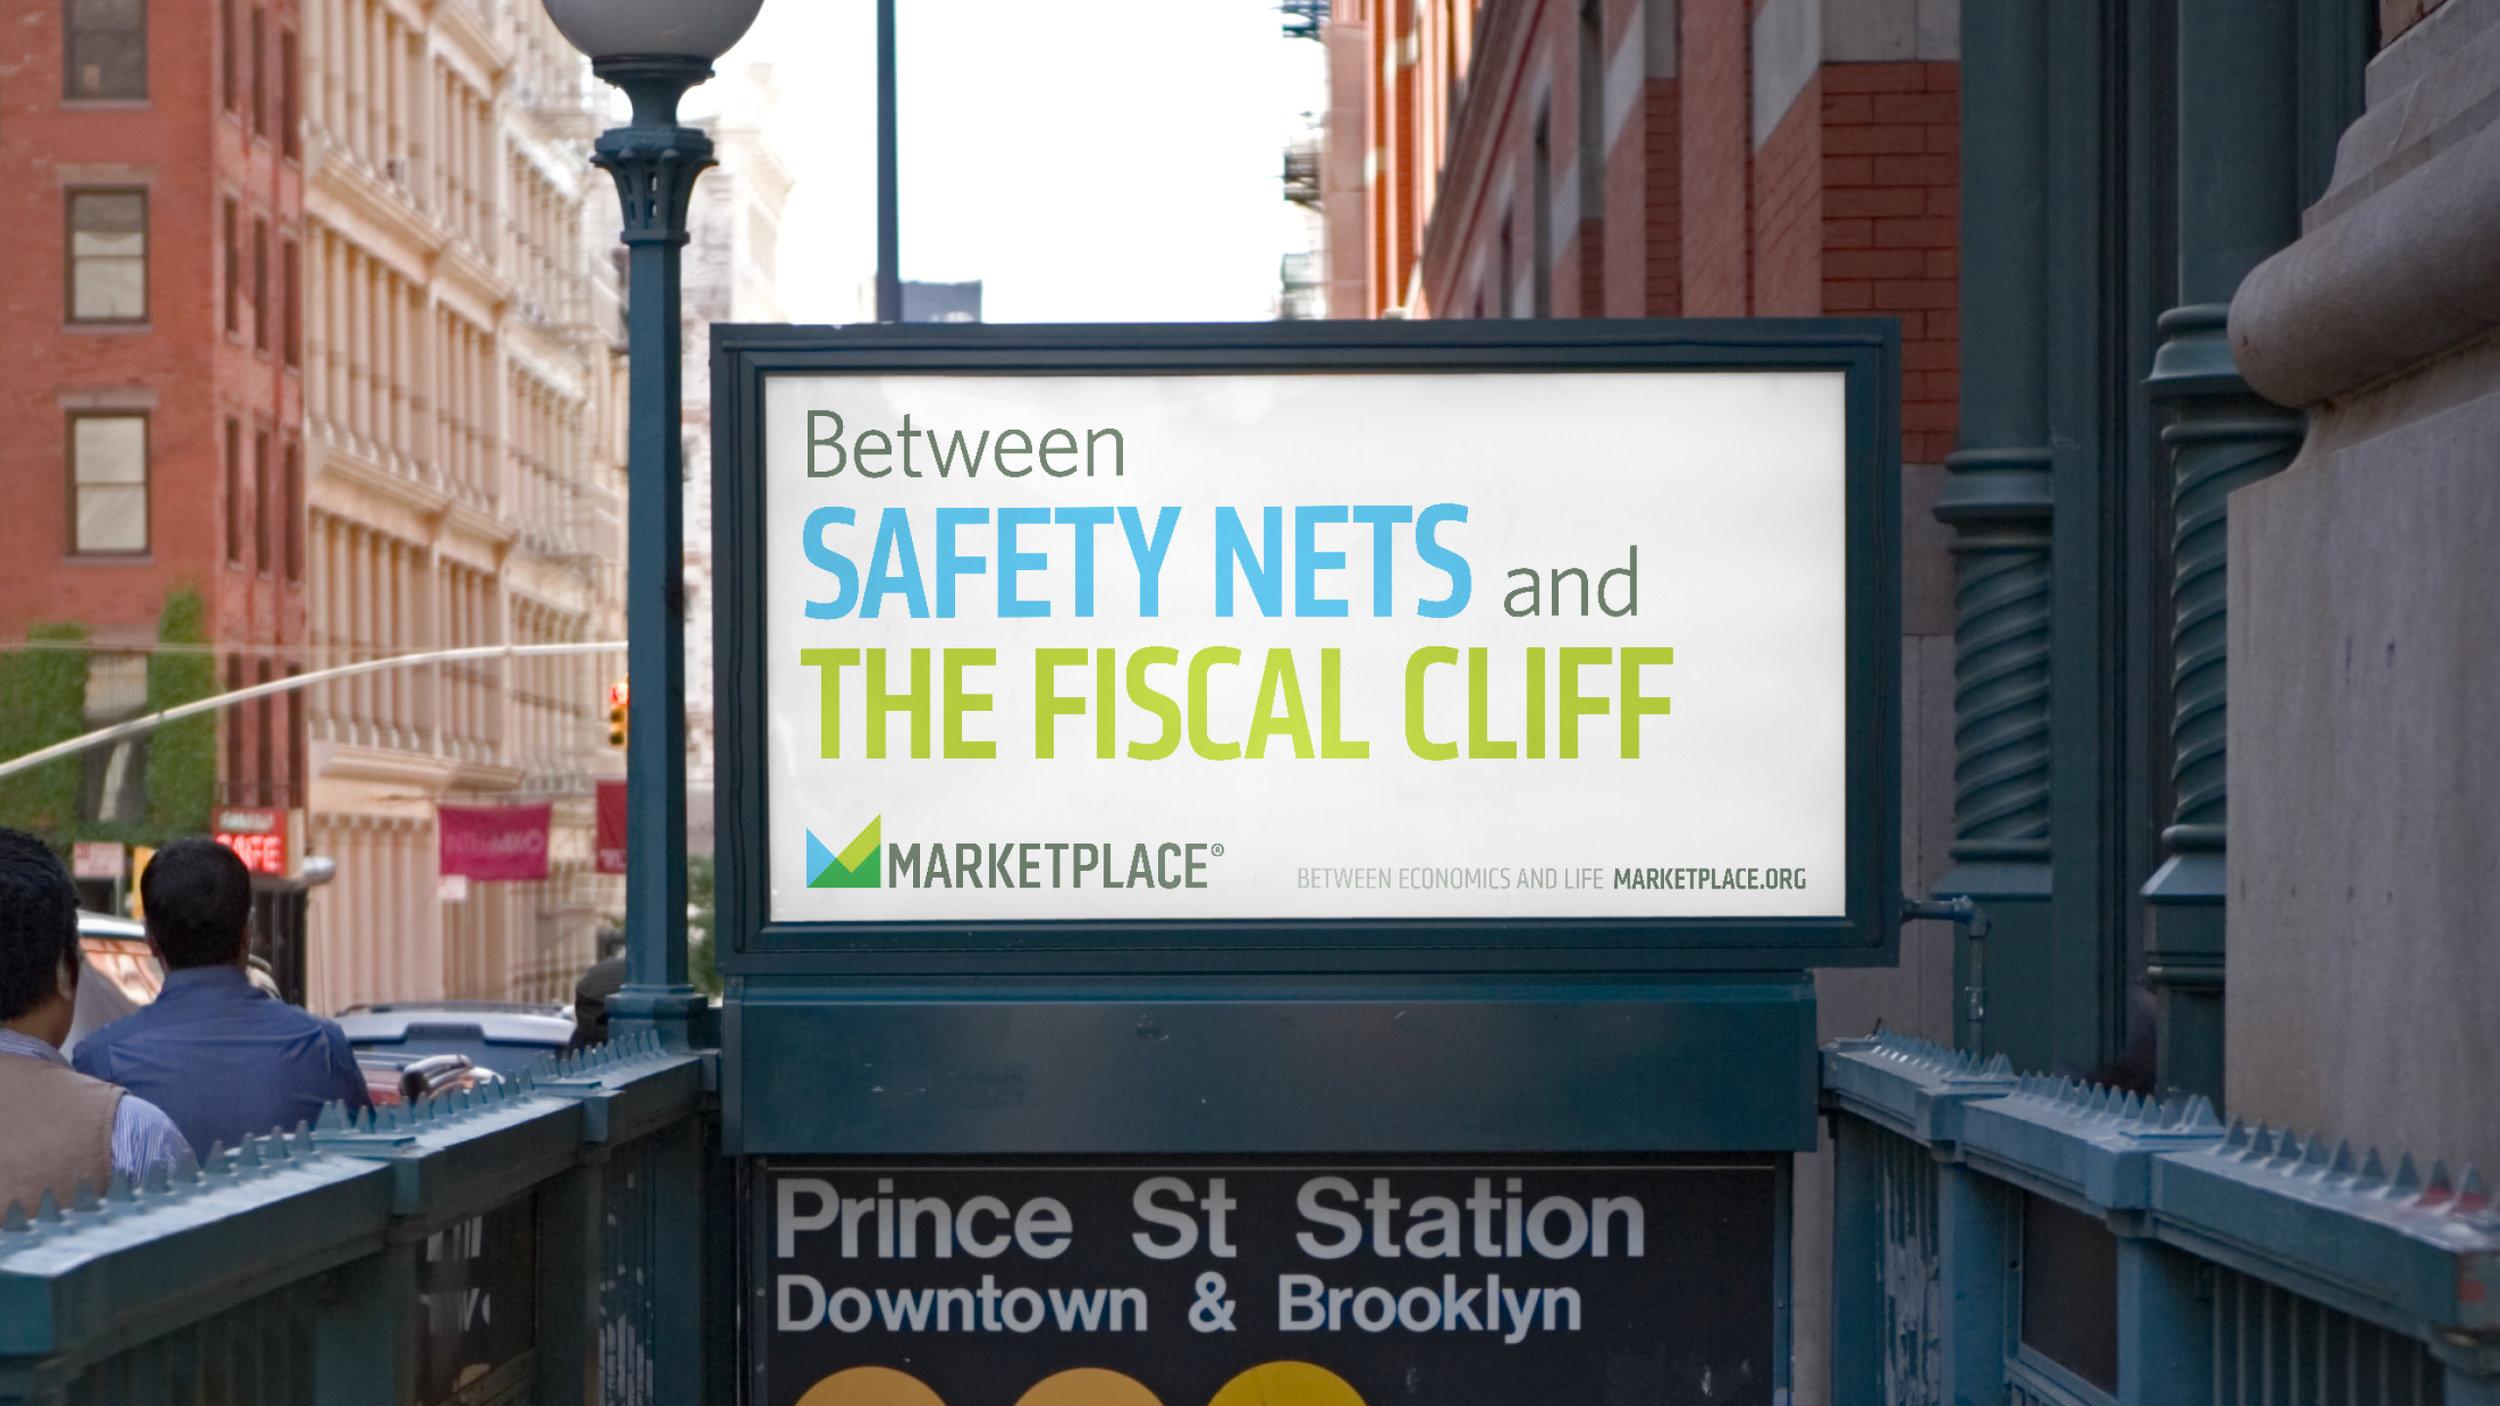 Marketplace Advertising